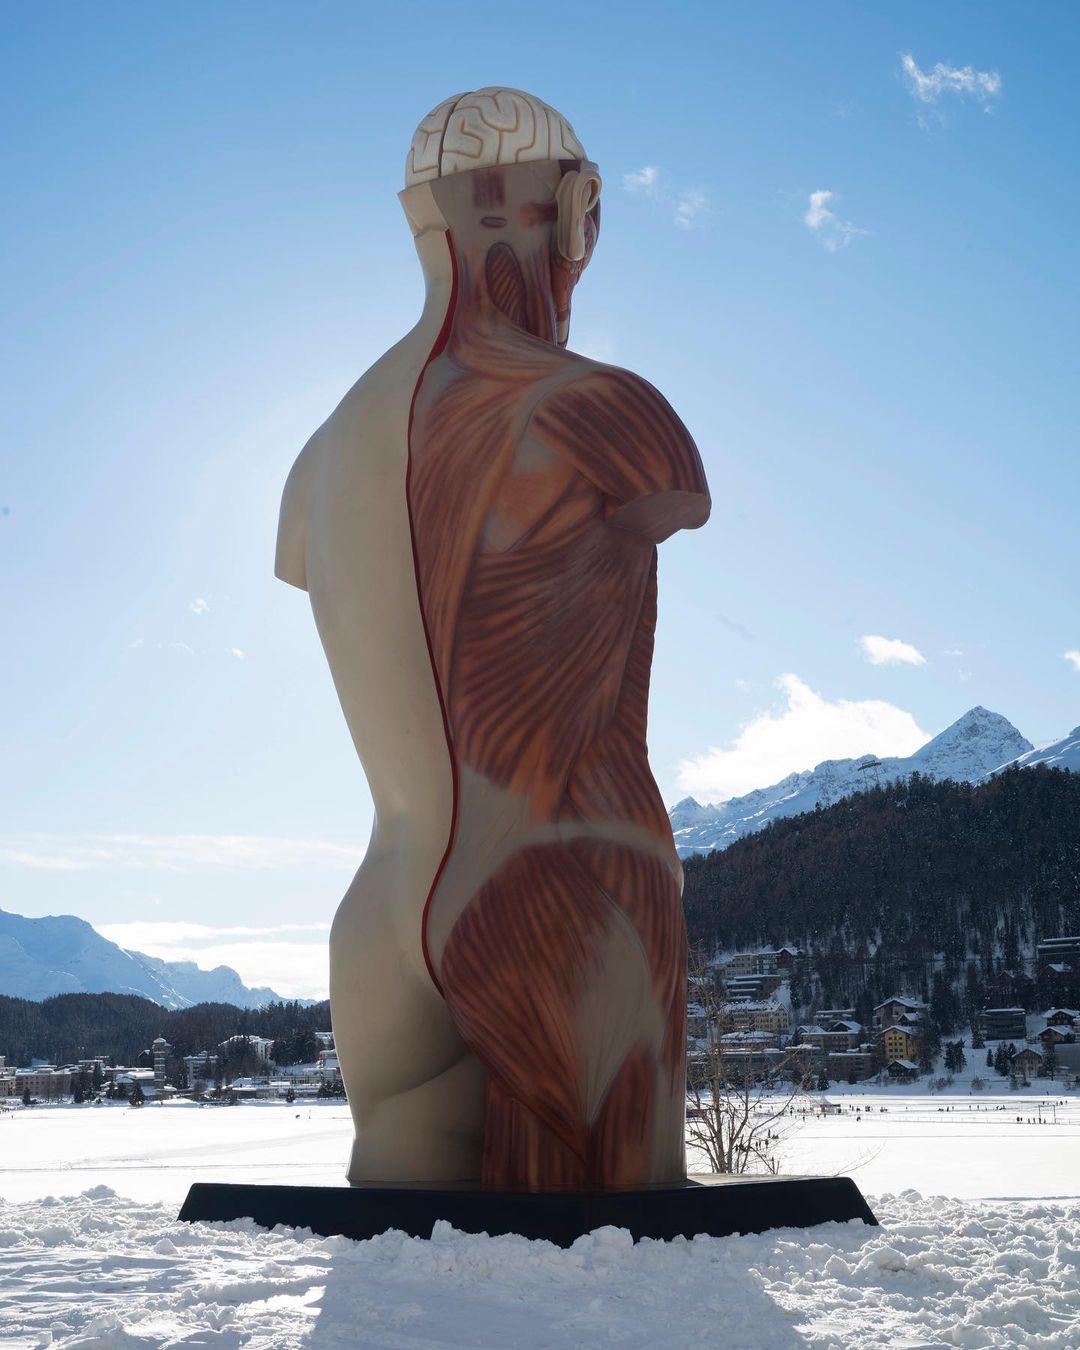 Damien Hirst, Temple, 2021, St Moritz, Dimlej (5)